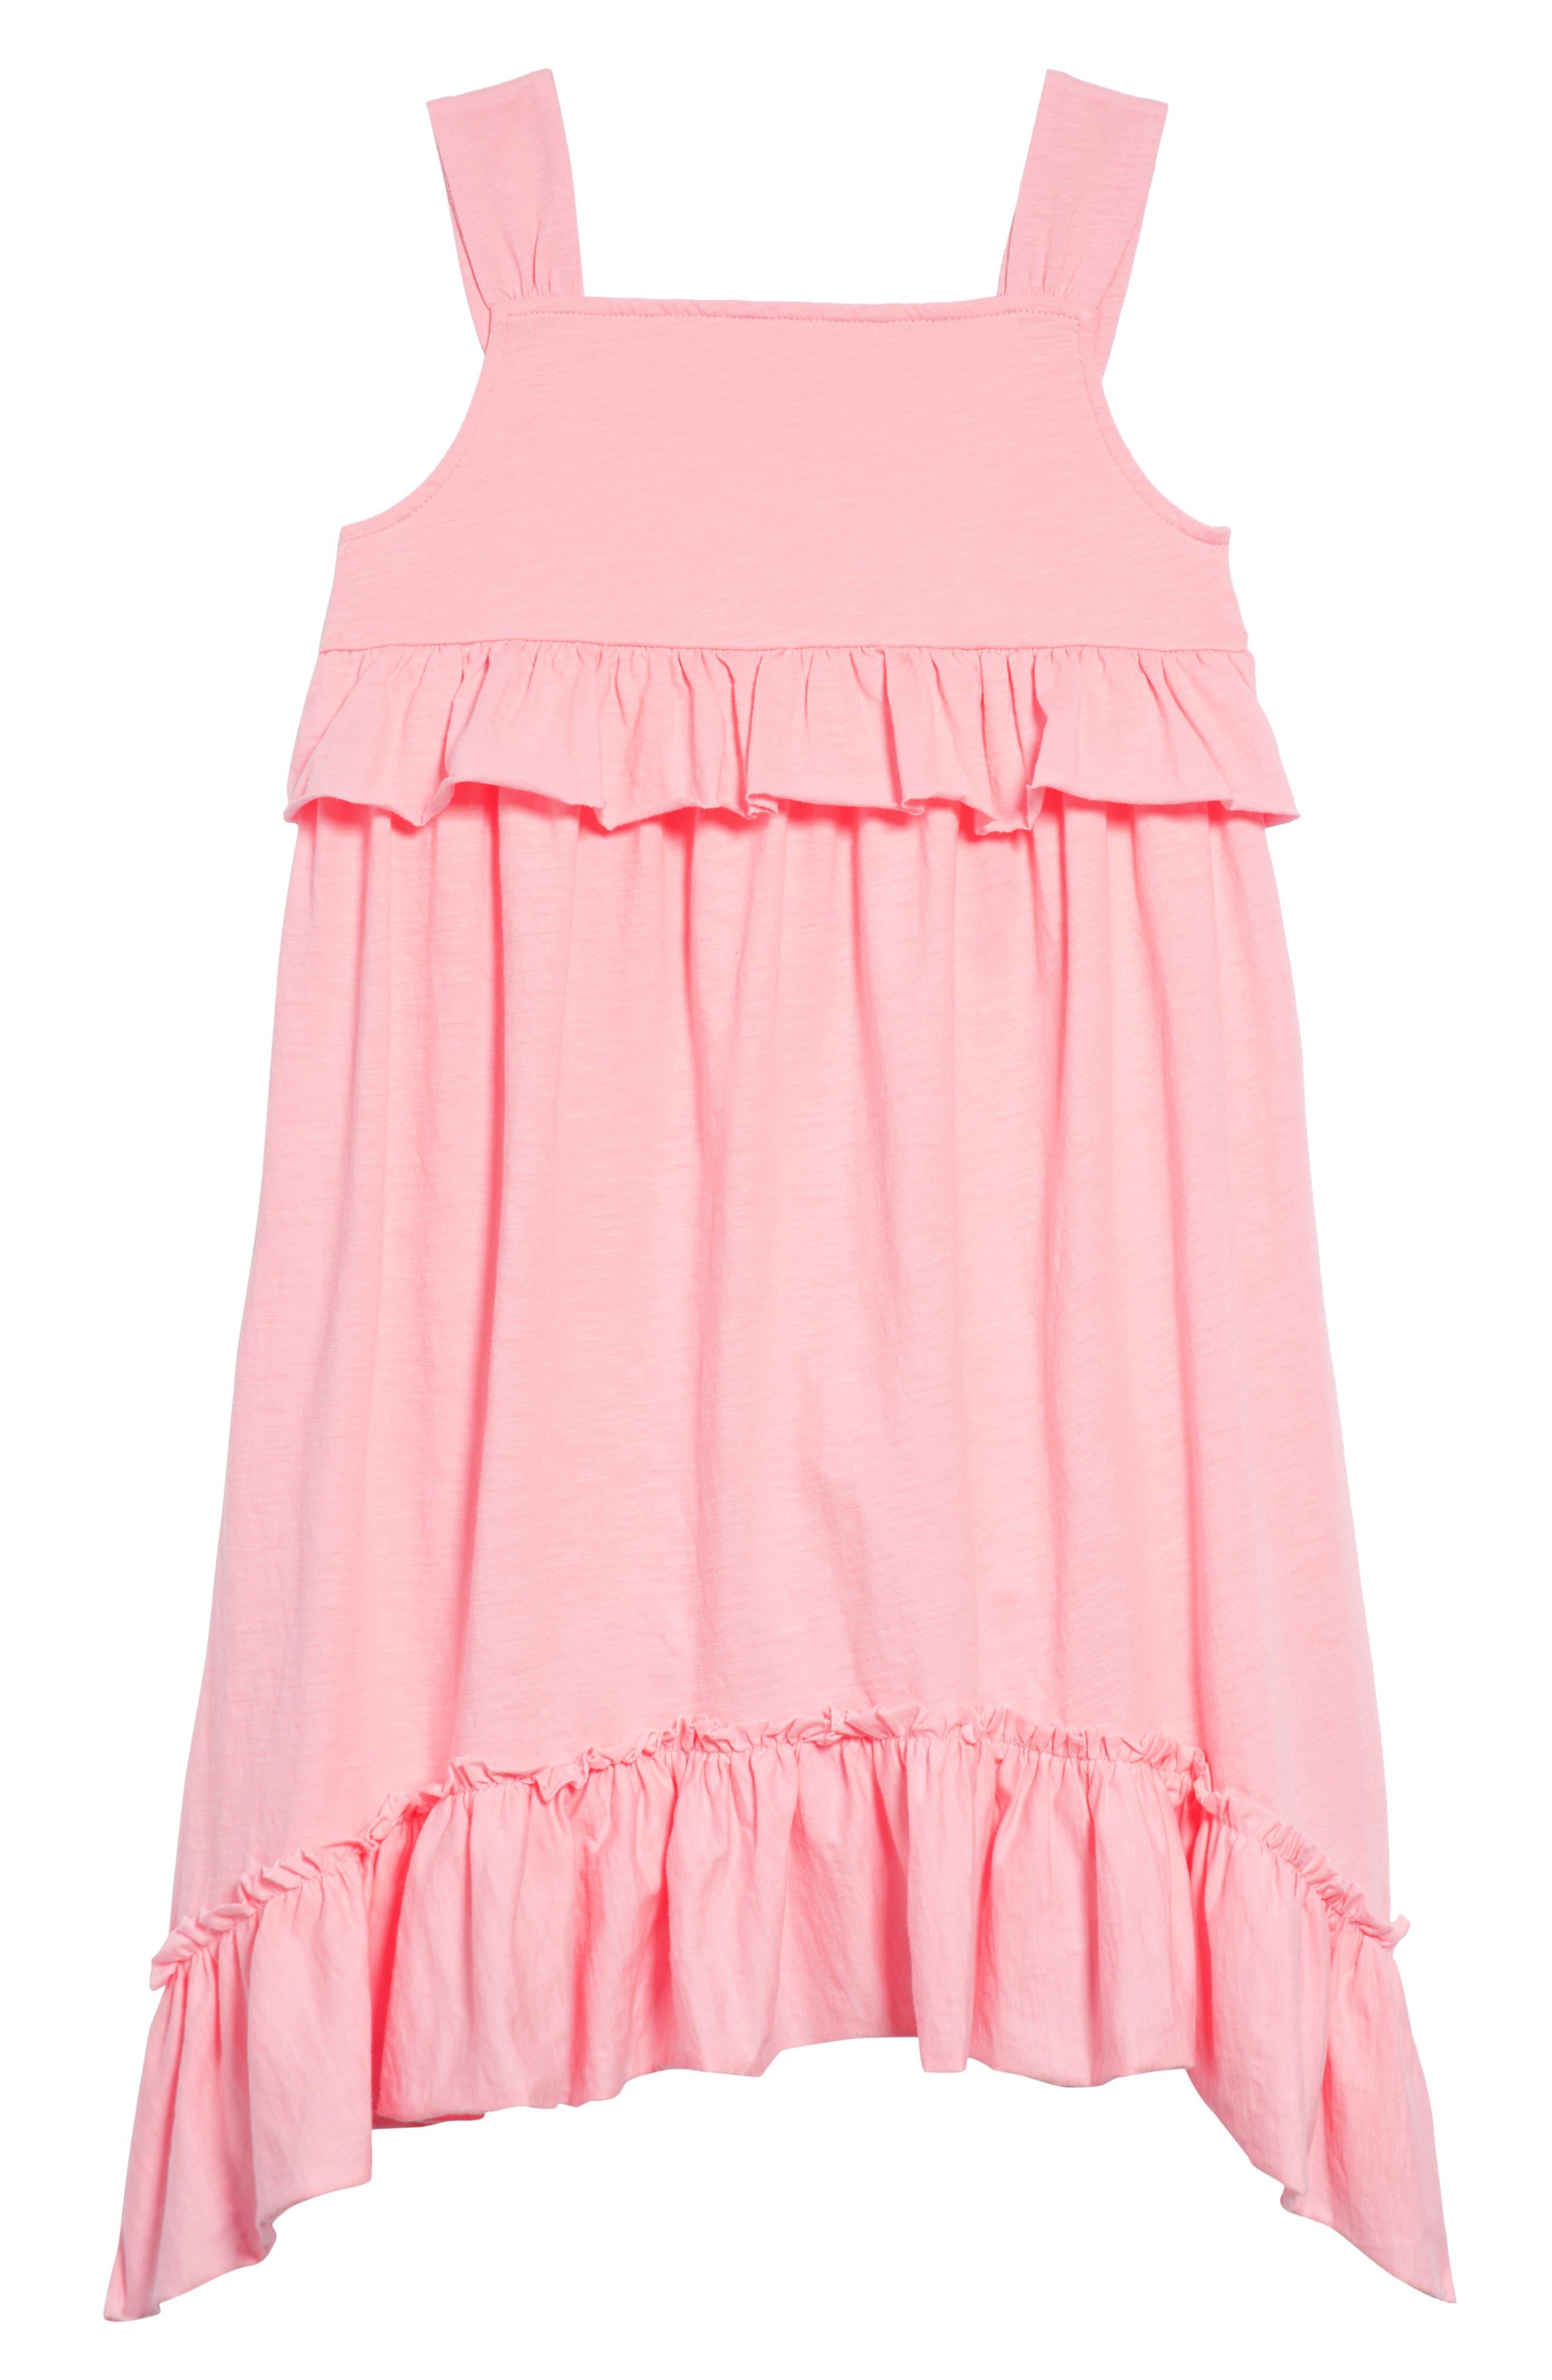 Mimi Ruffle Dress,                             Main thumbnail 1, color,                             Neon Petal Pk-5038